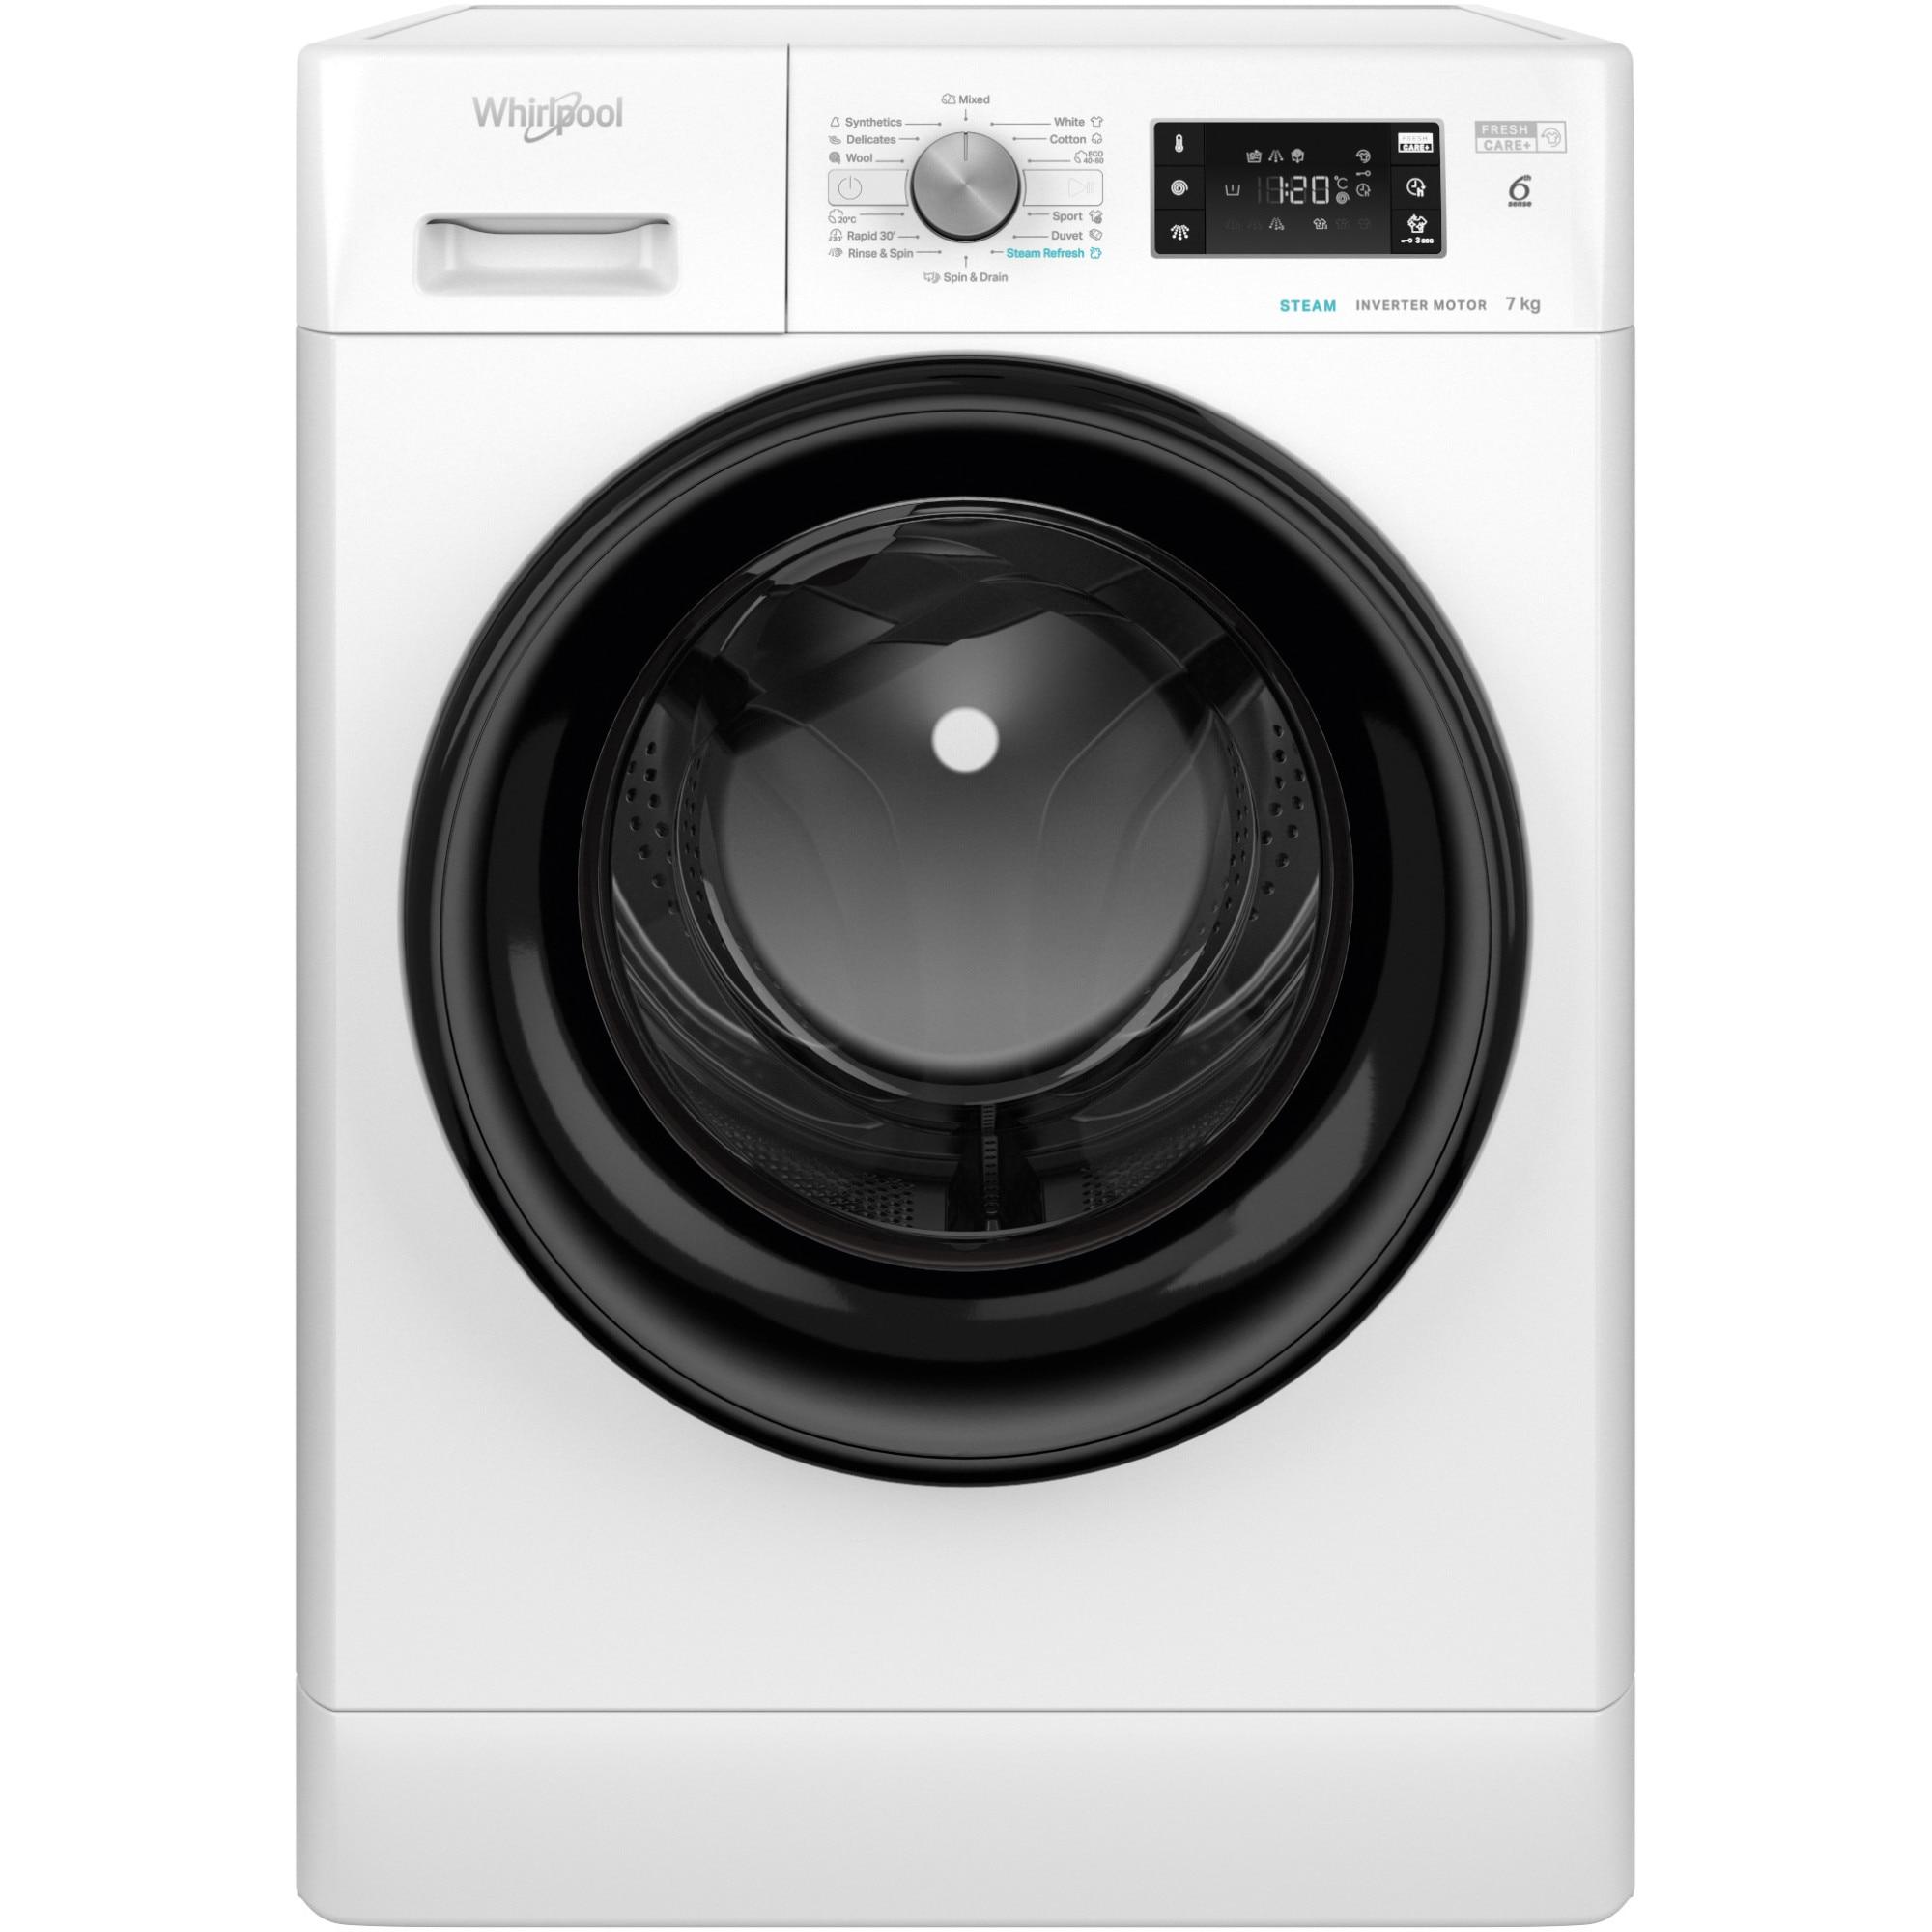 Fotografie Masina de spalat rufe Whirlpool FFB7438BVEE, 7kg, 1400 RPM, Clasa A+++, Tehnologia al-6lea Simt, Motor Inverter, FreshCare+, Steam Refresh, Alb